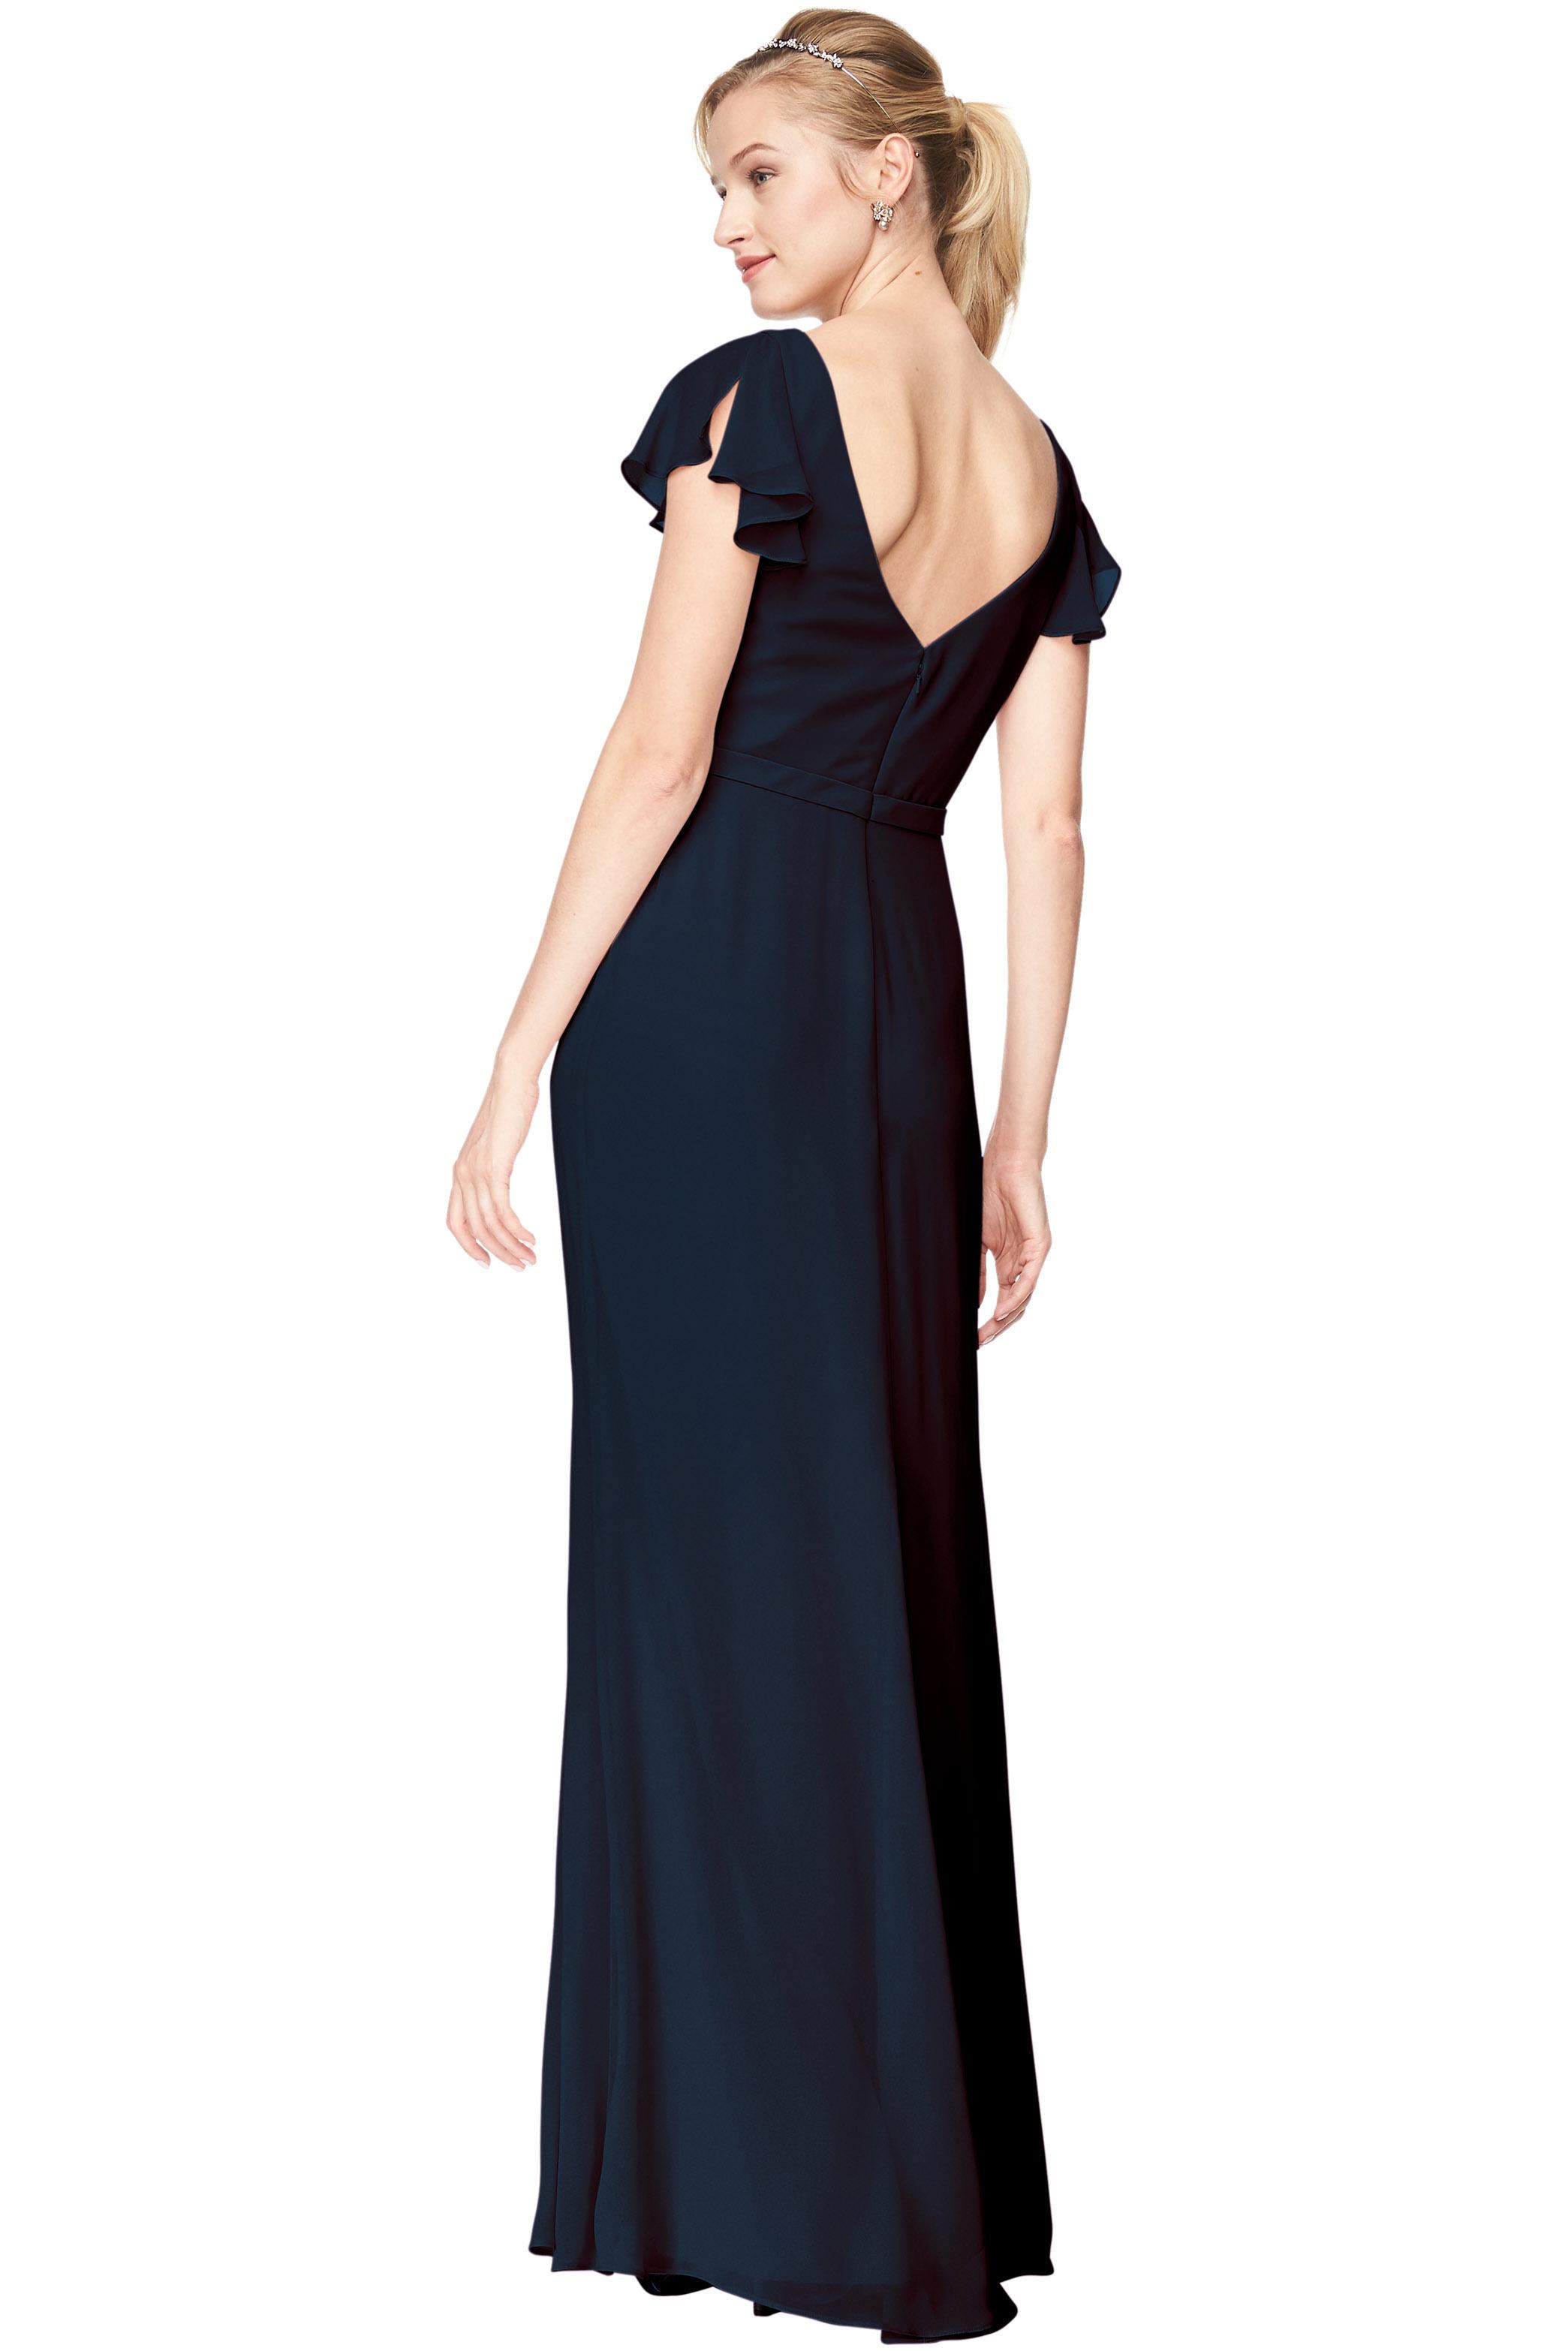 Bill Levkoff NAVY Chiffon V-Neck A-Line gown, $184.00 Back